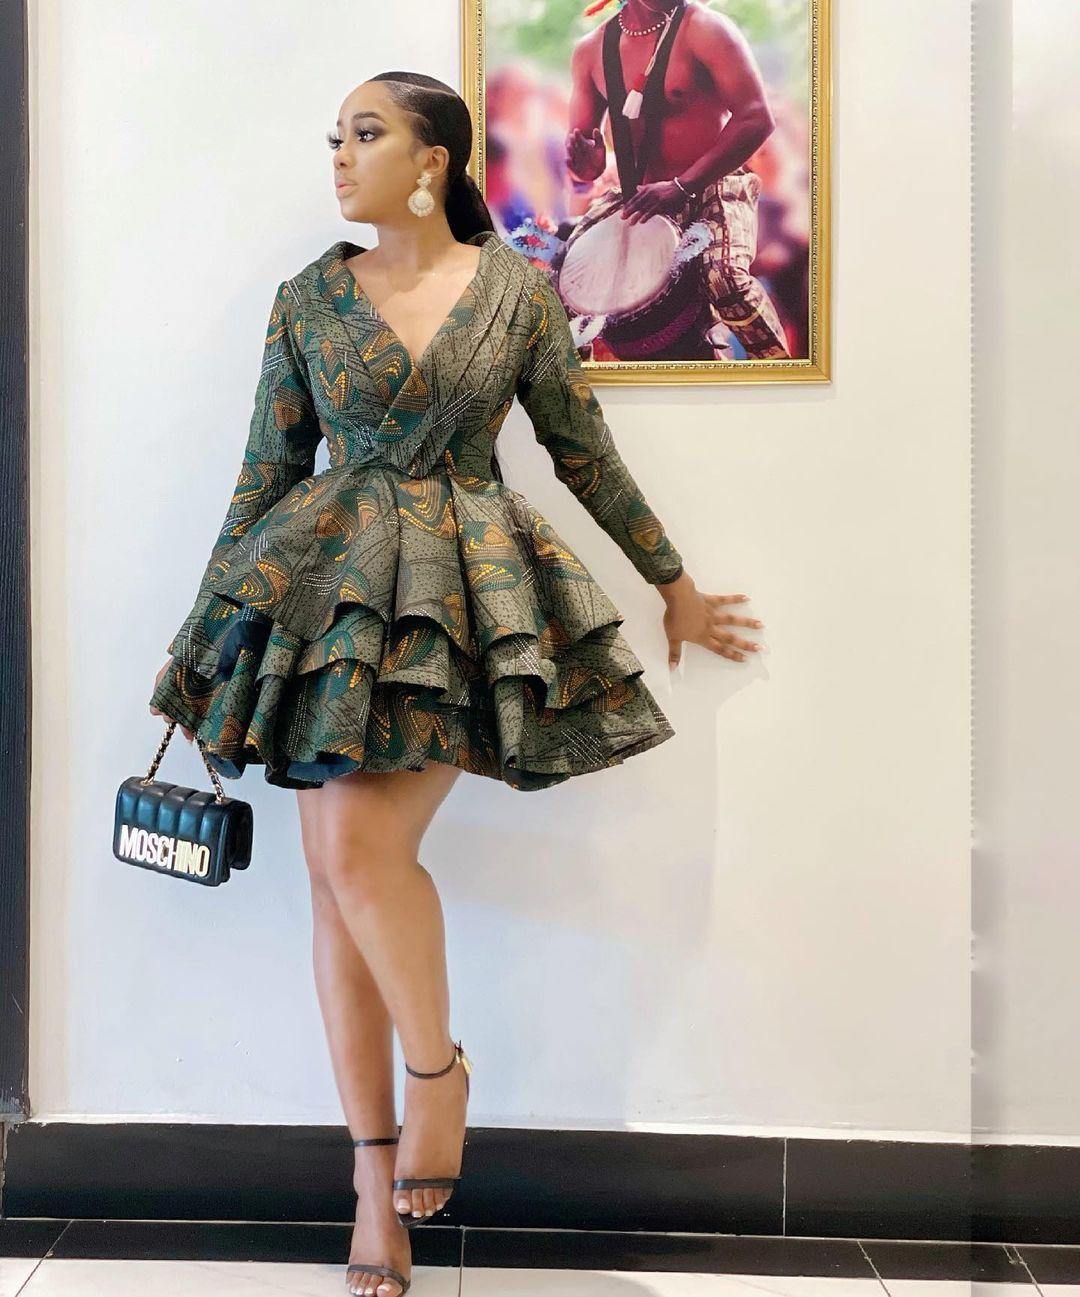 african-fashion-looks-best-dressed-kome-osalor-in-ankara